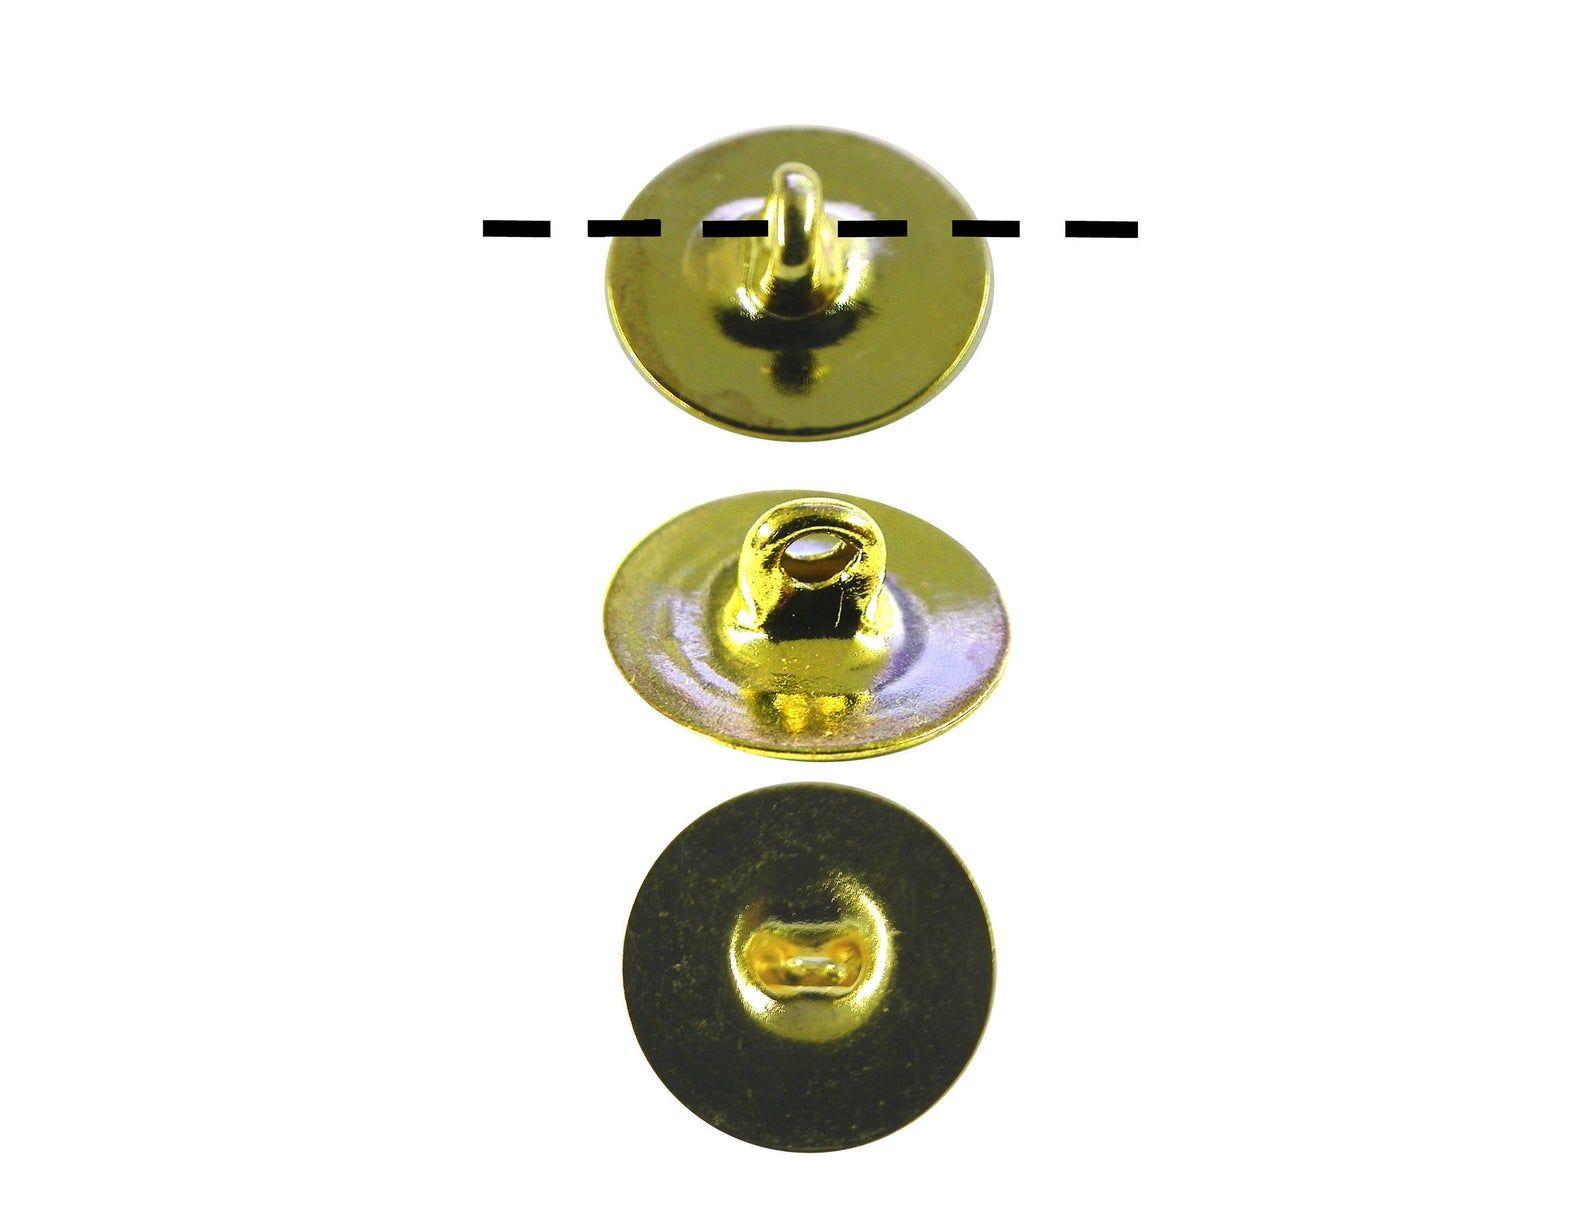 12 1 dozen gold plated 10mm glueable button backs shanks